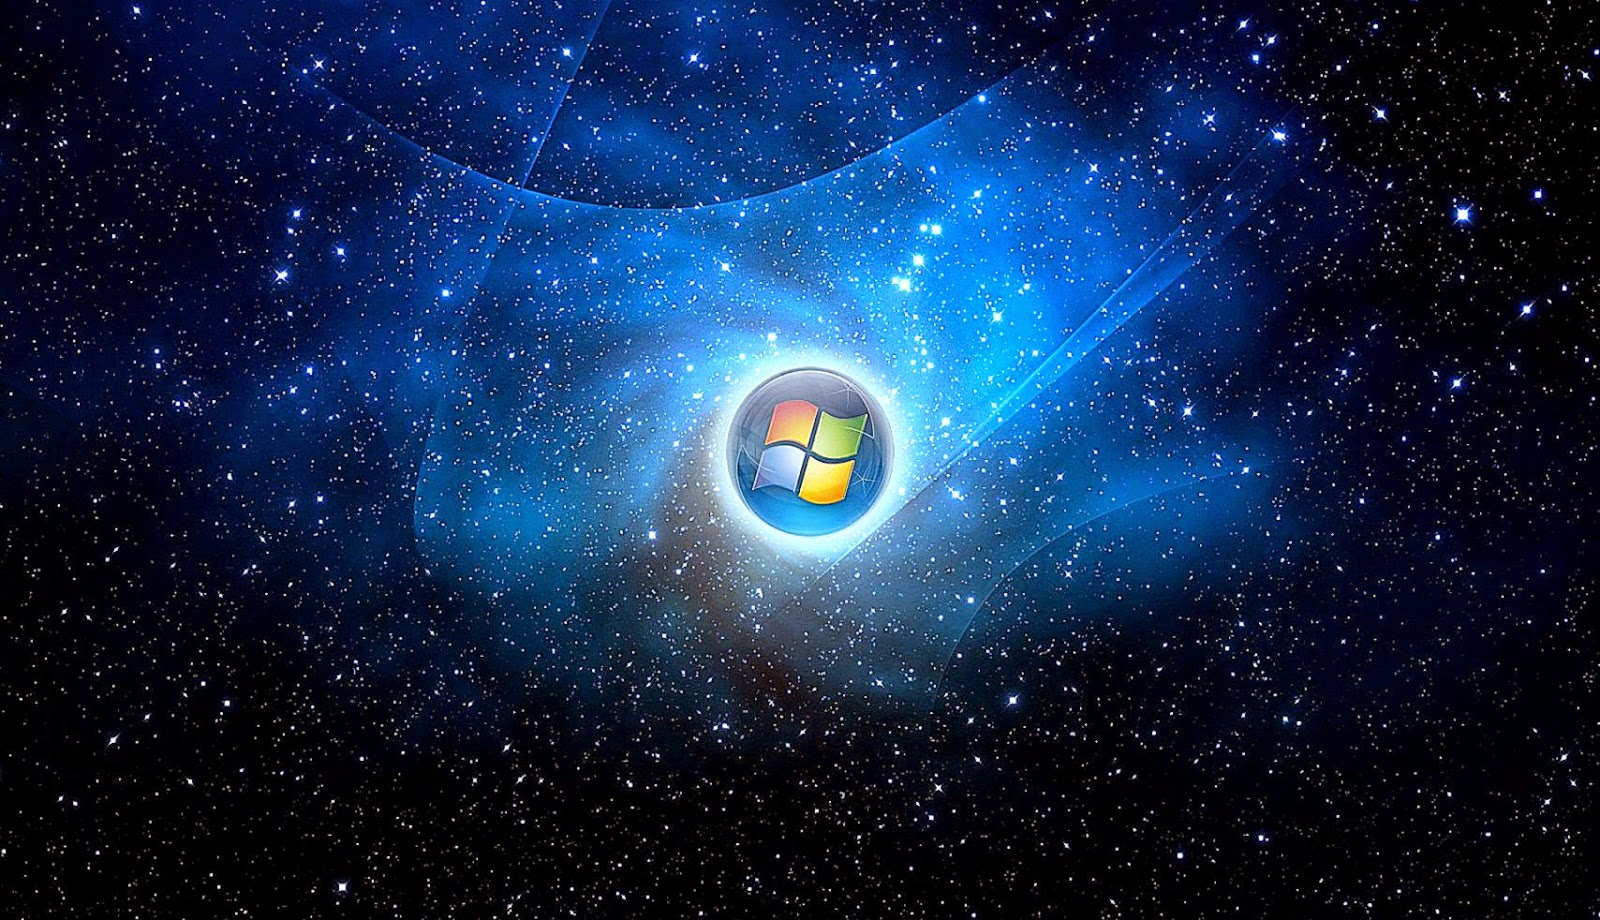 Windows 7 lighthouse wallpaper wallpapersafari - Windows 7 space wallpaper ...